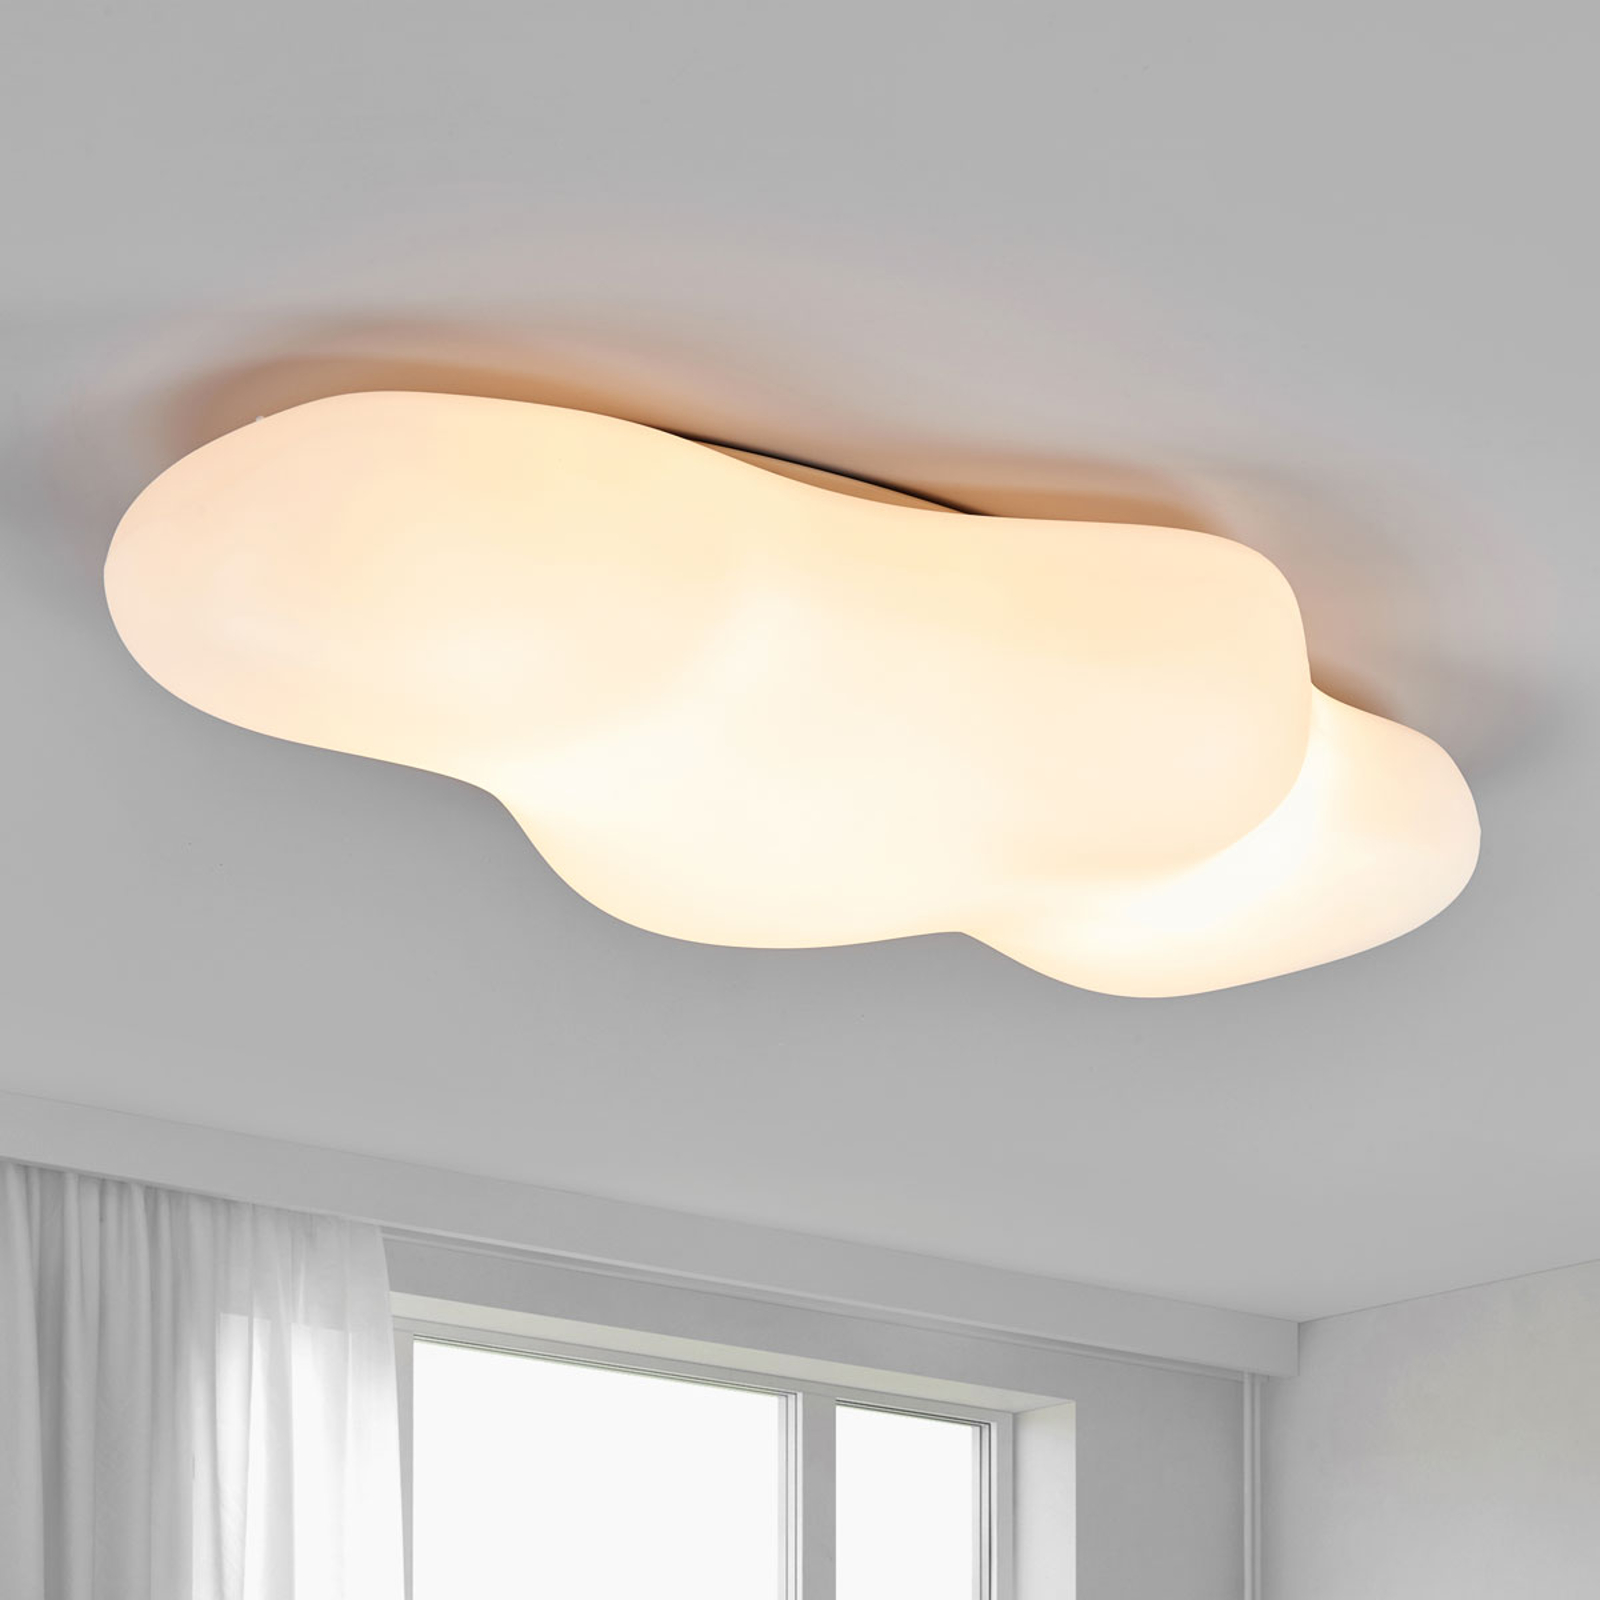 Plafondlamp Eos in wolkenvorm, 90 cm